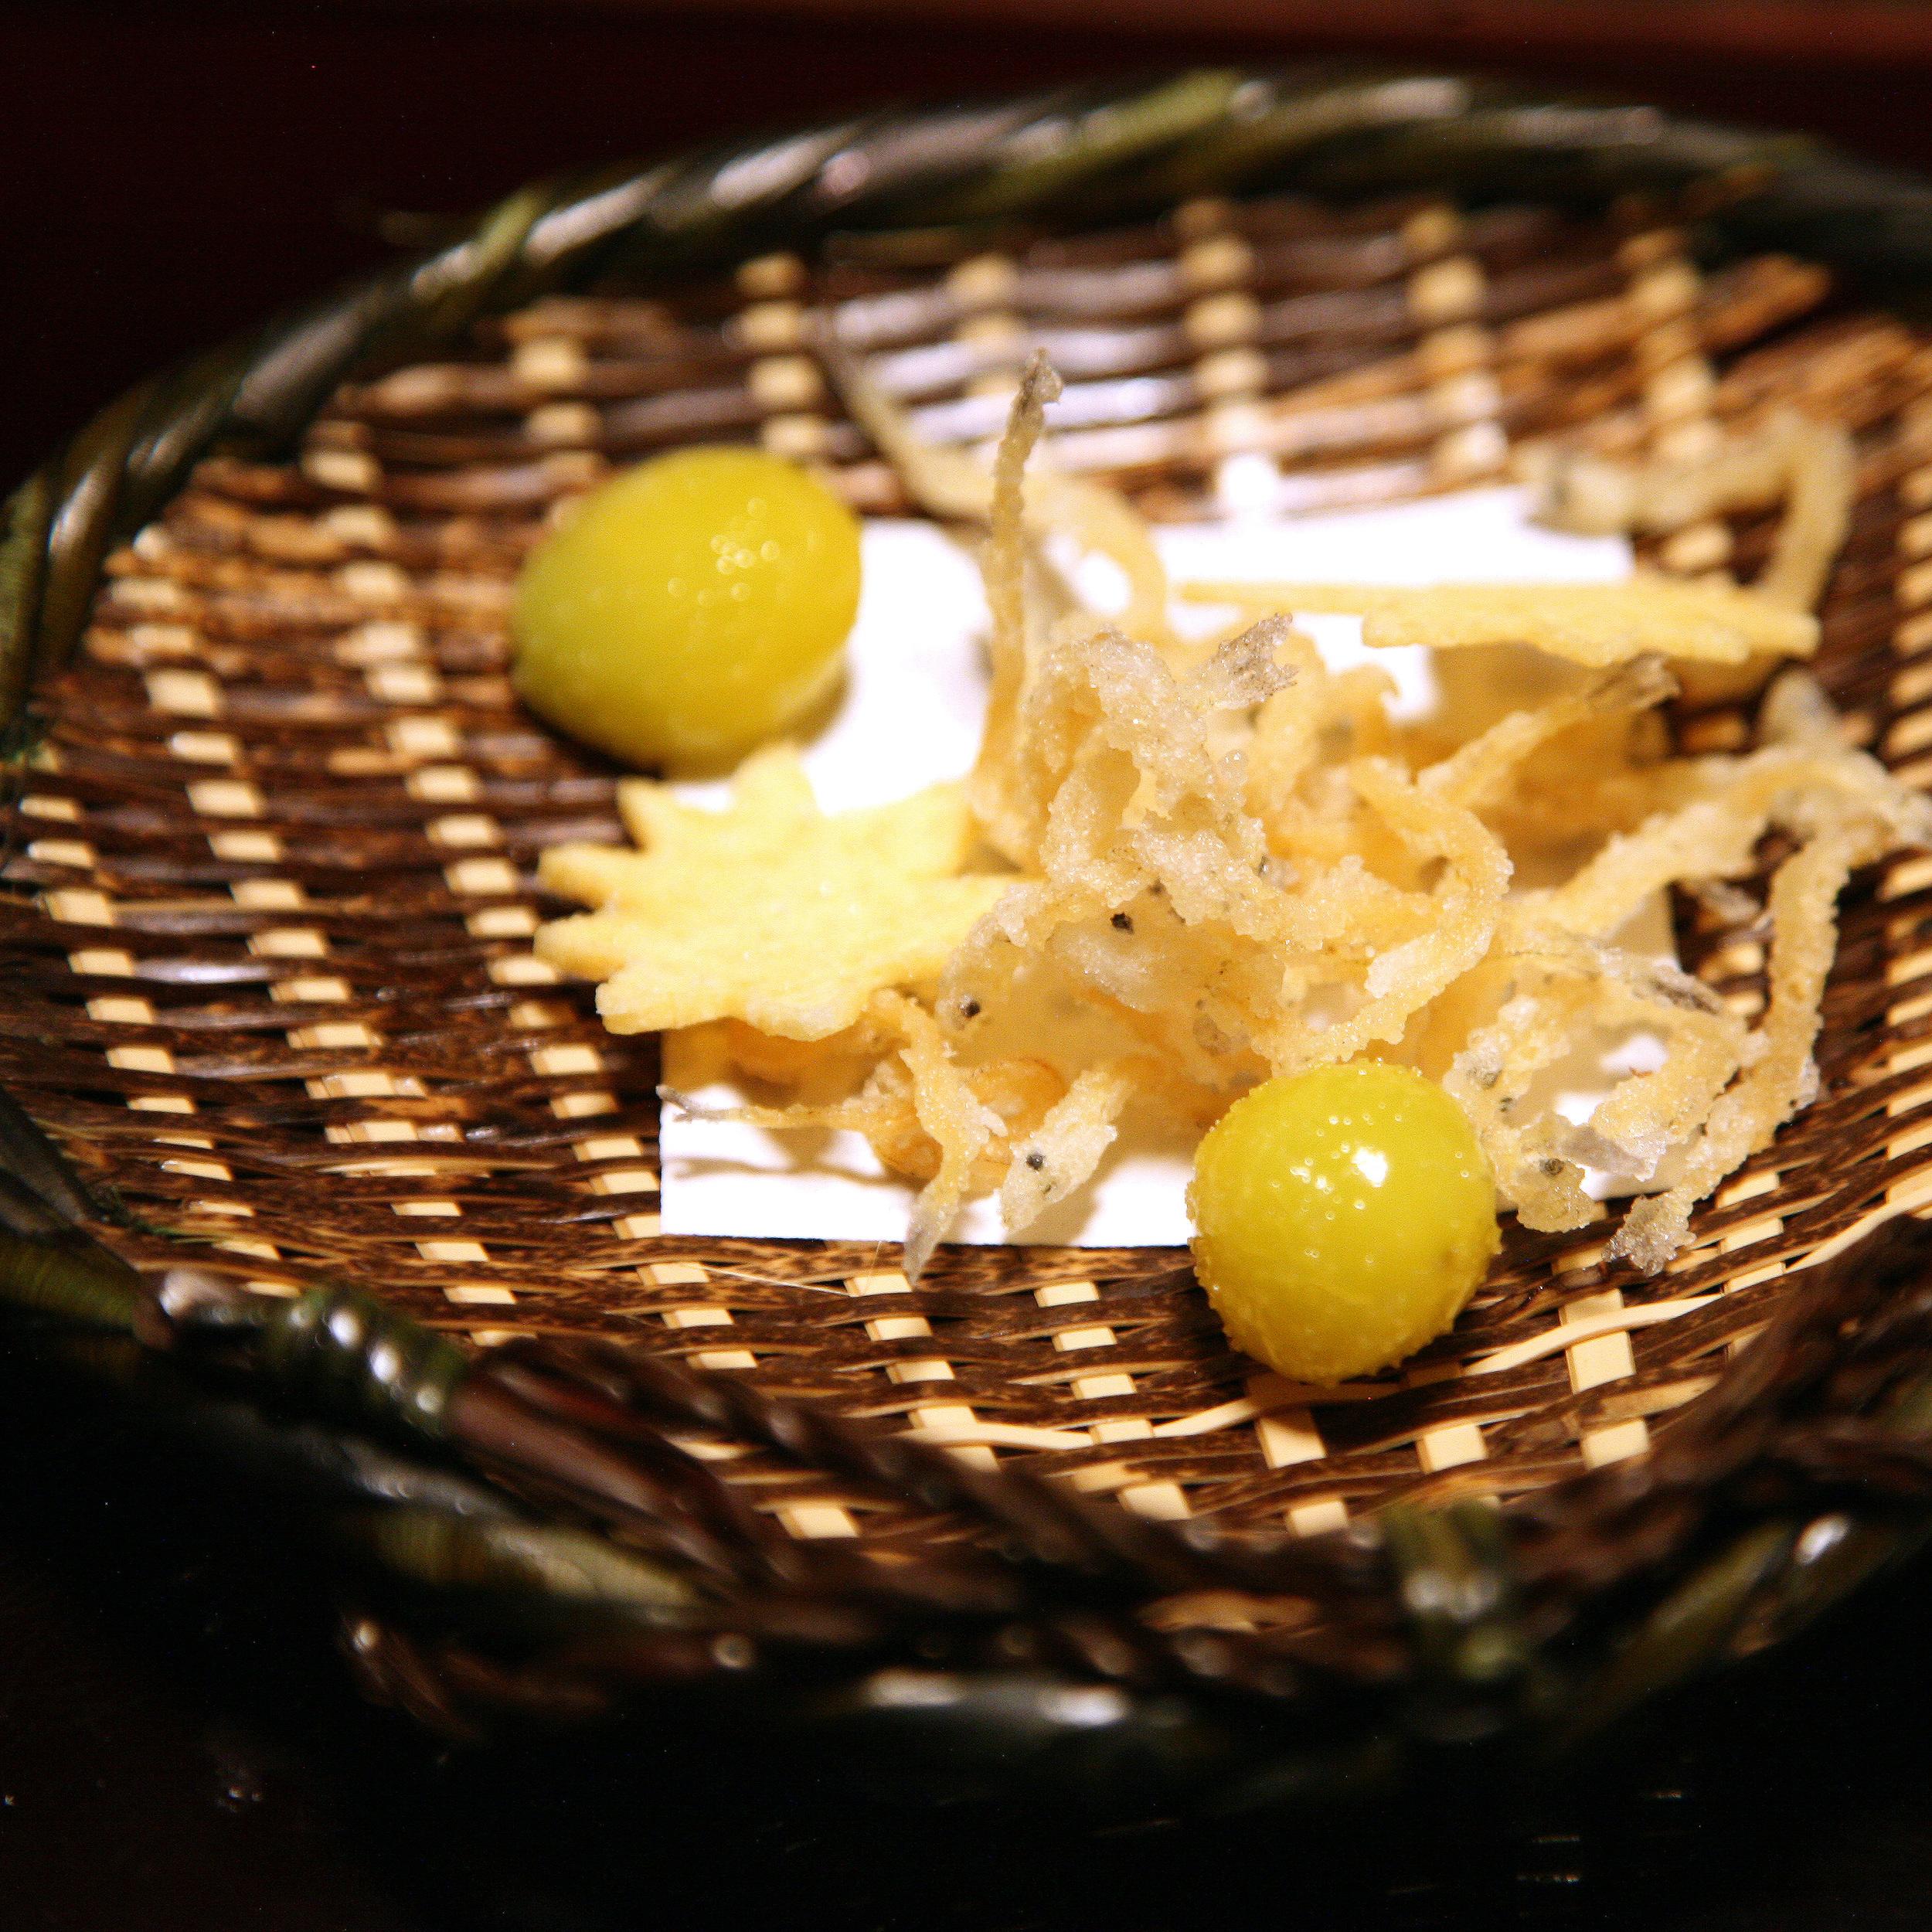 Takamura, Tokyo - Small fish with ginko nuts